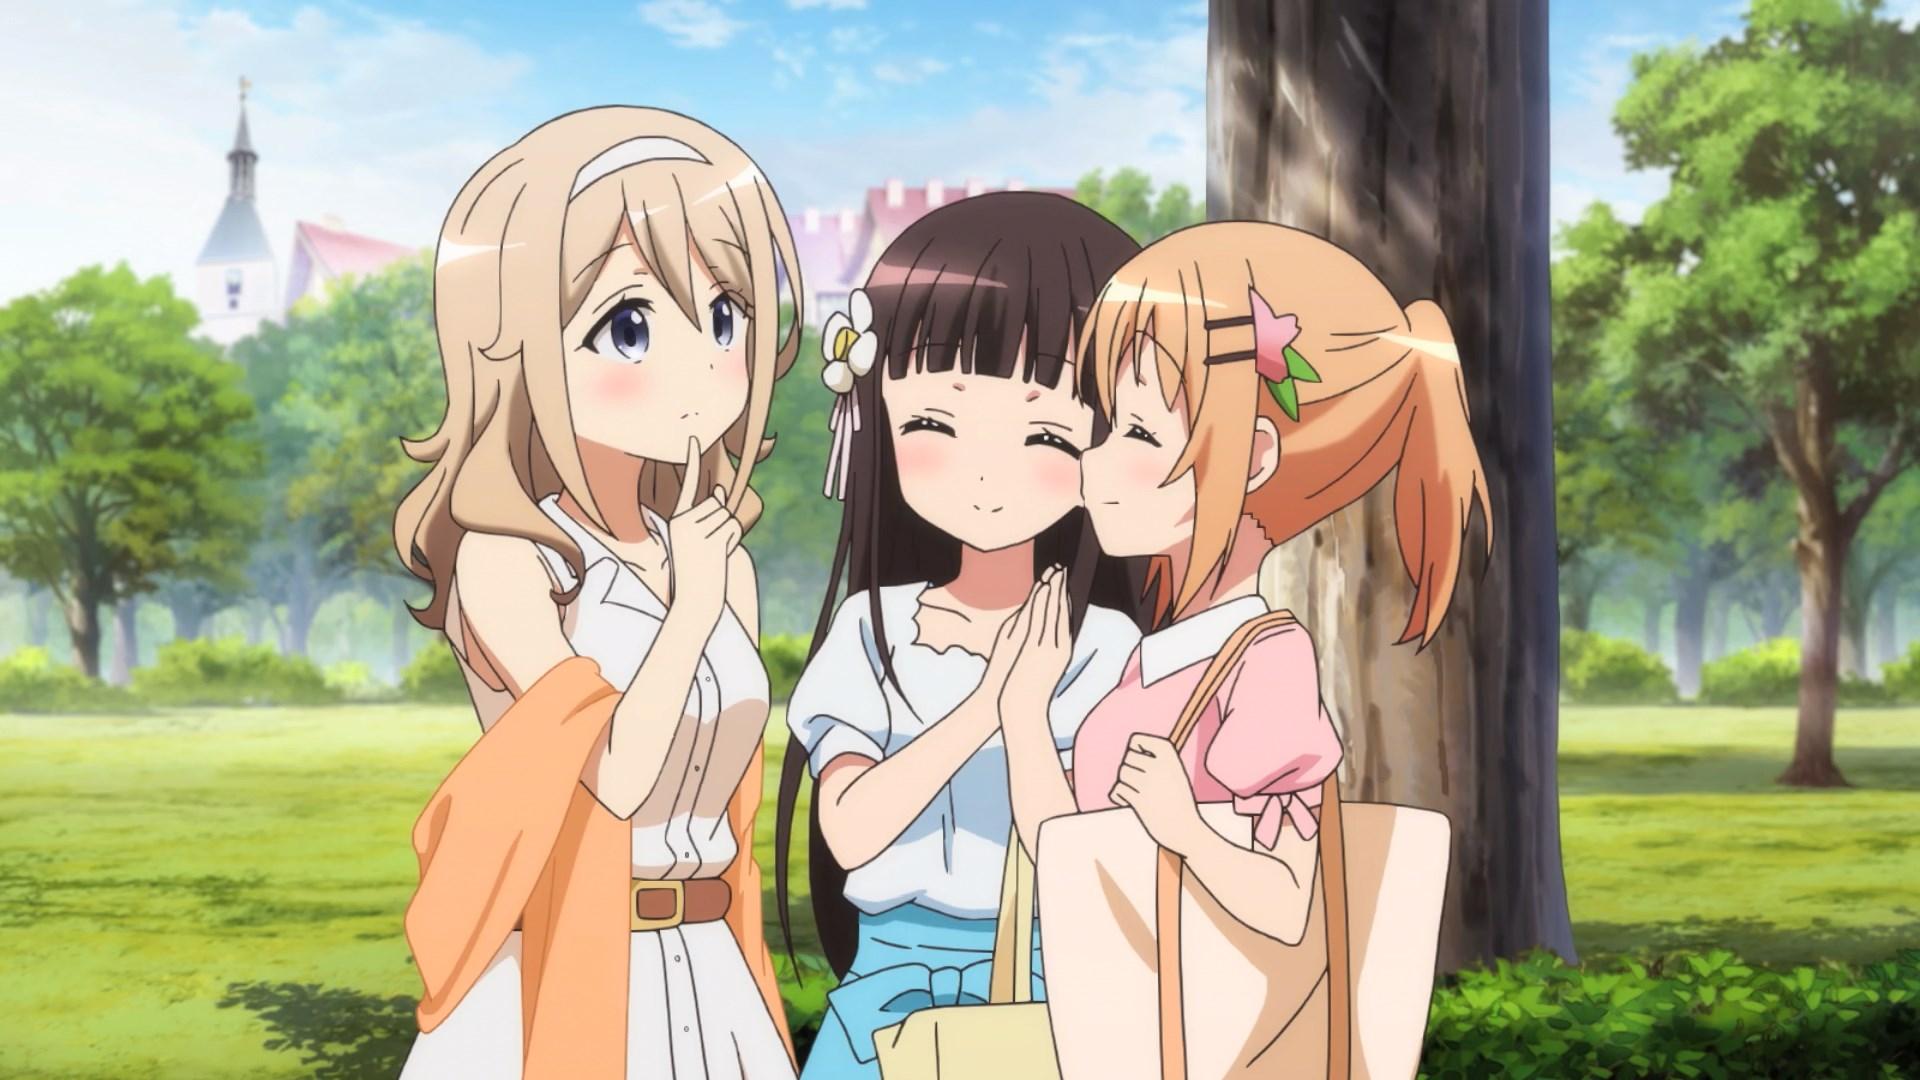 Aoyama, Cocoa and Chiya